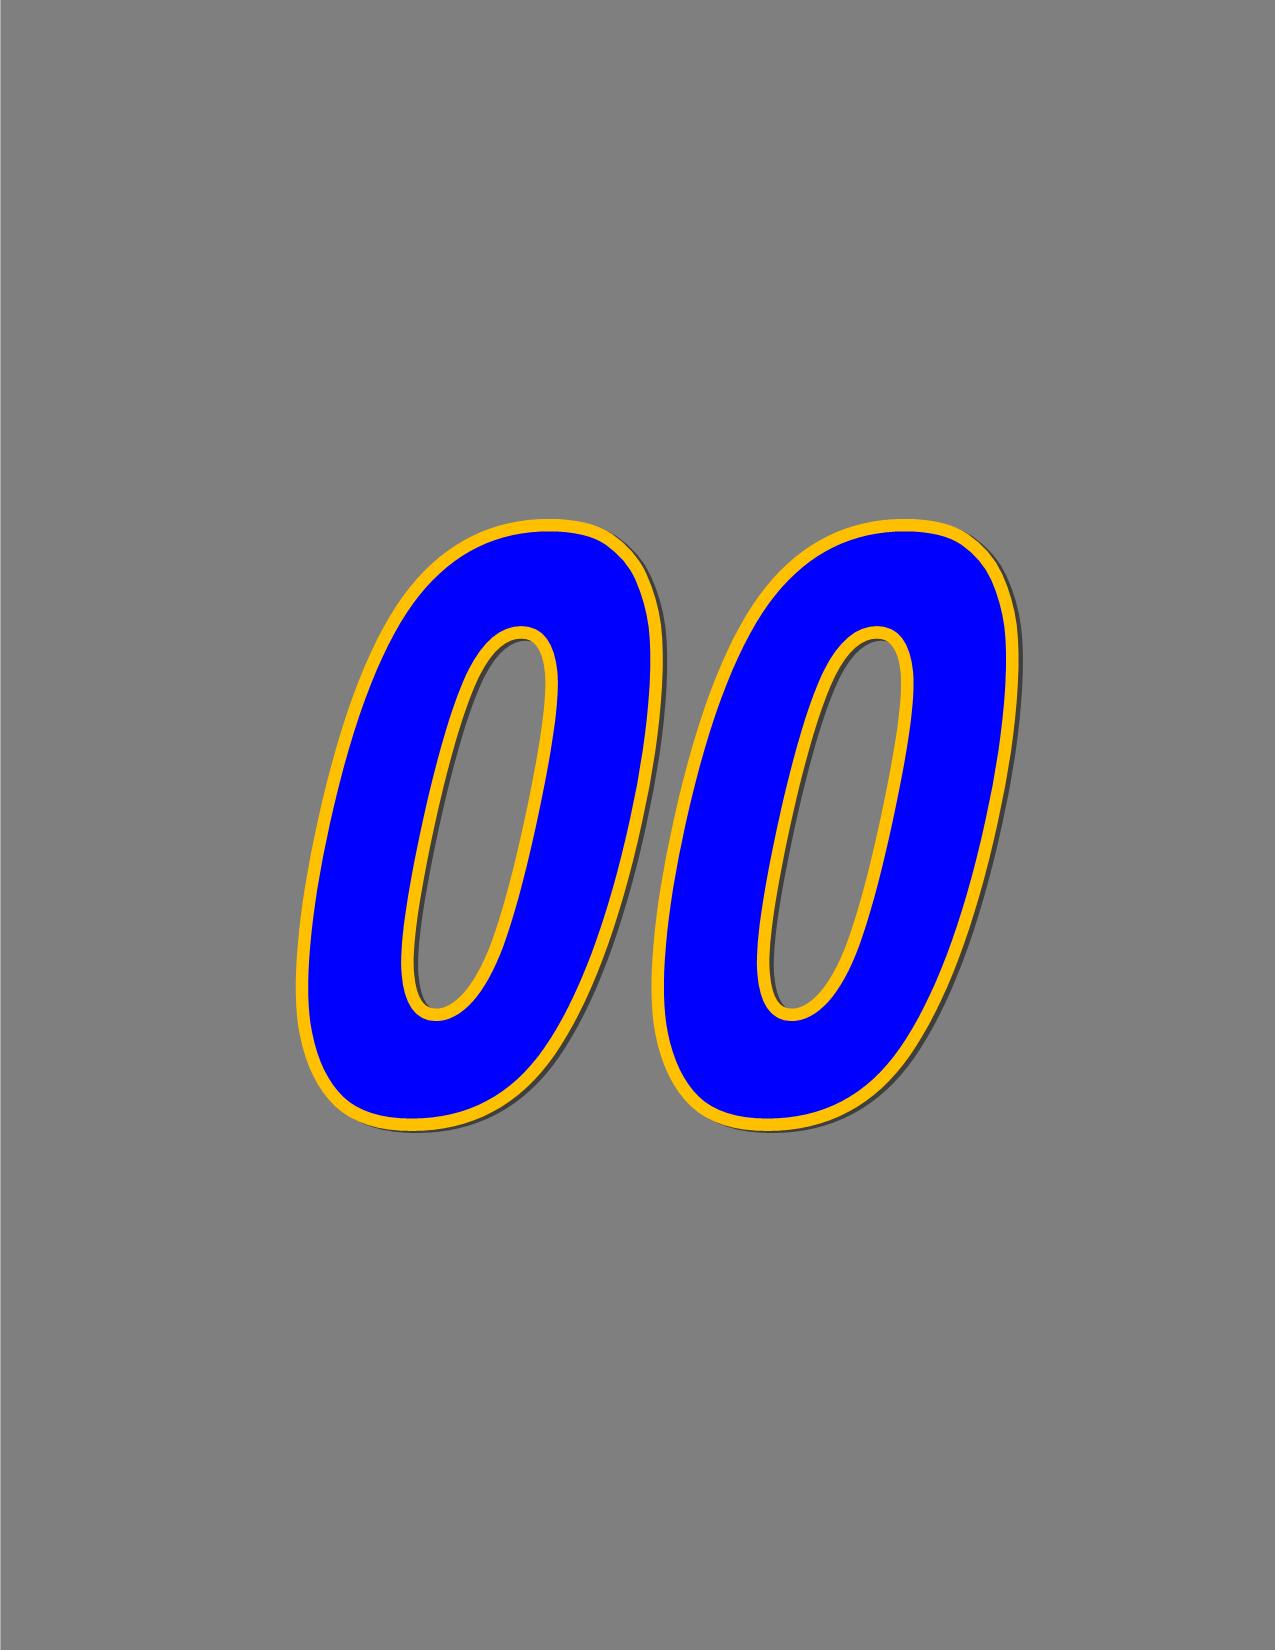 Number 00